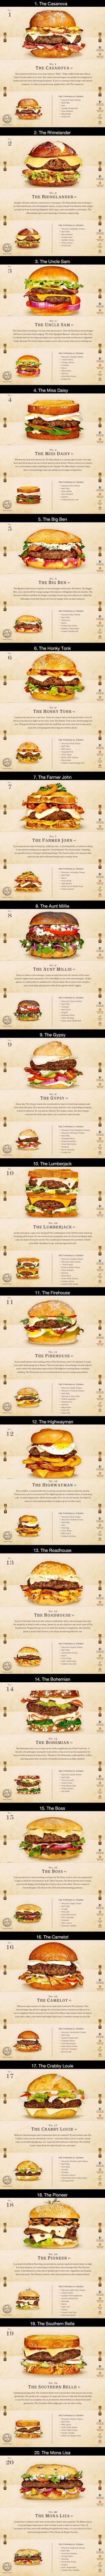 40 Glorious Burger Combinations Part 1